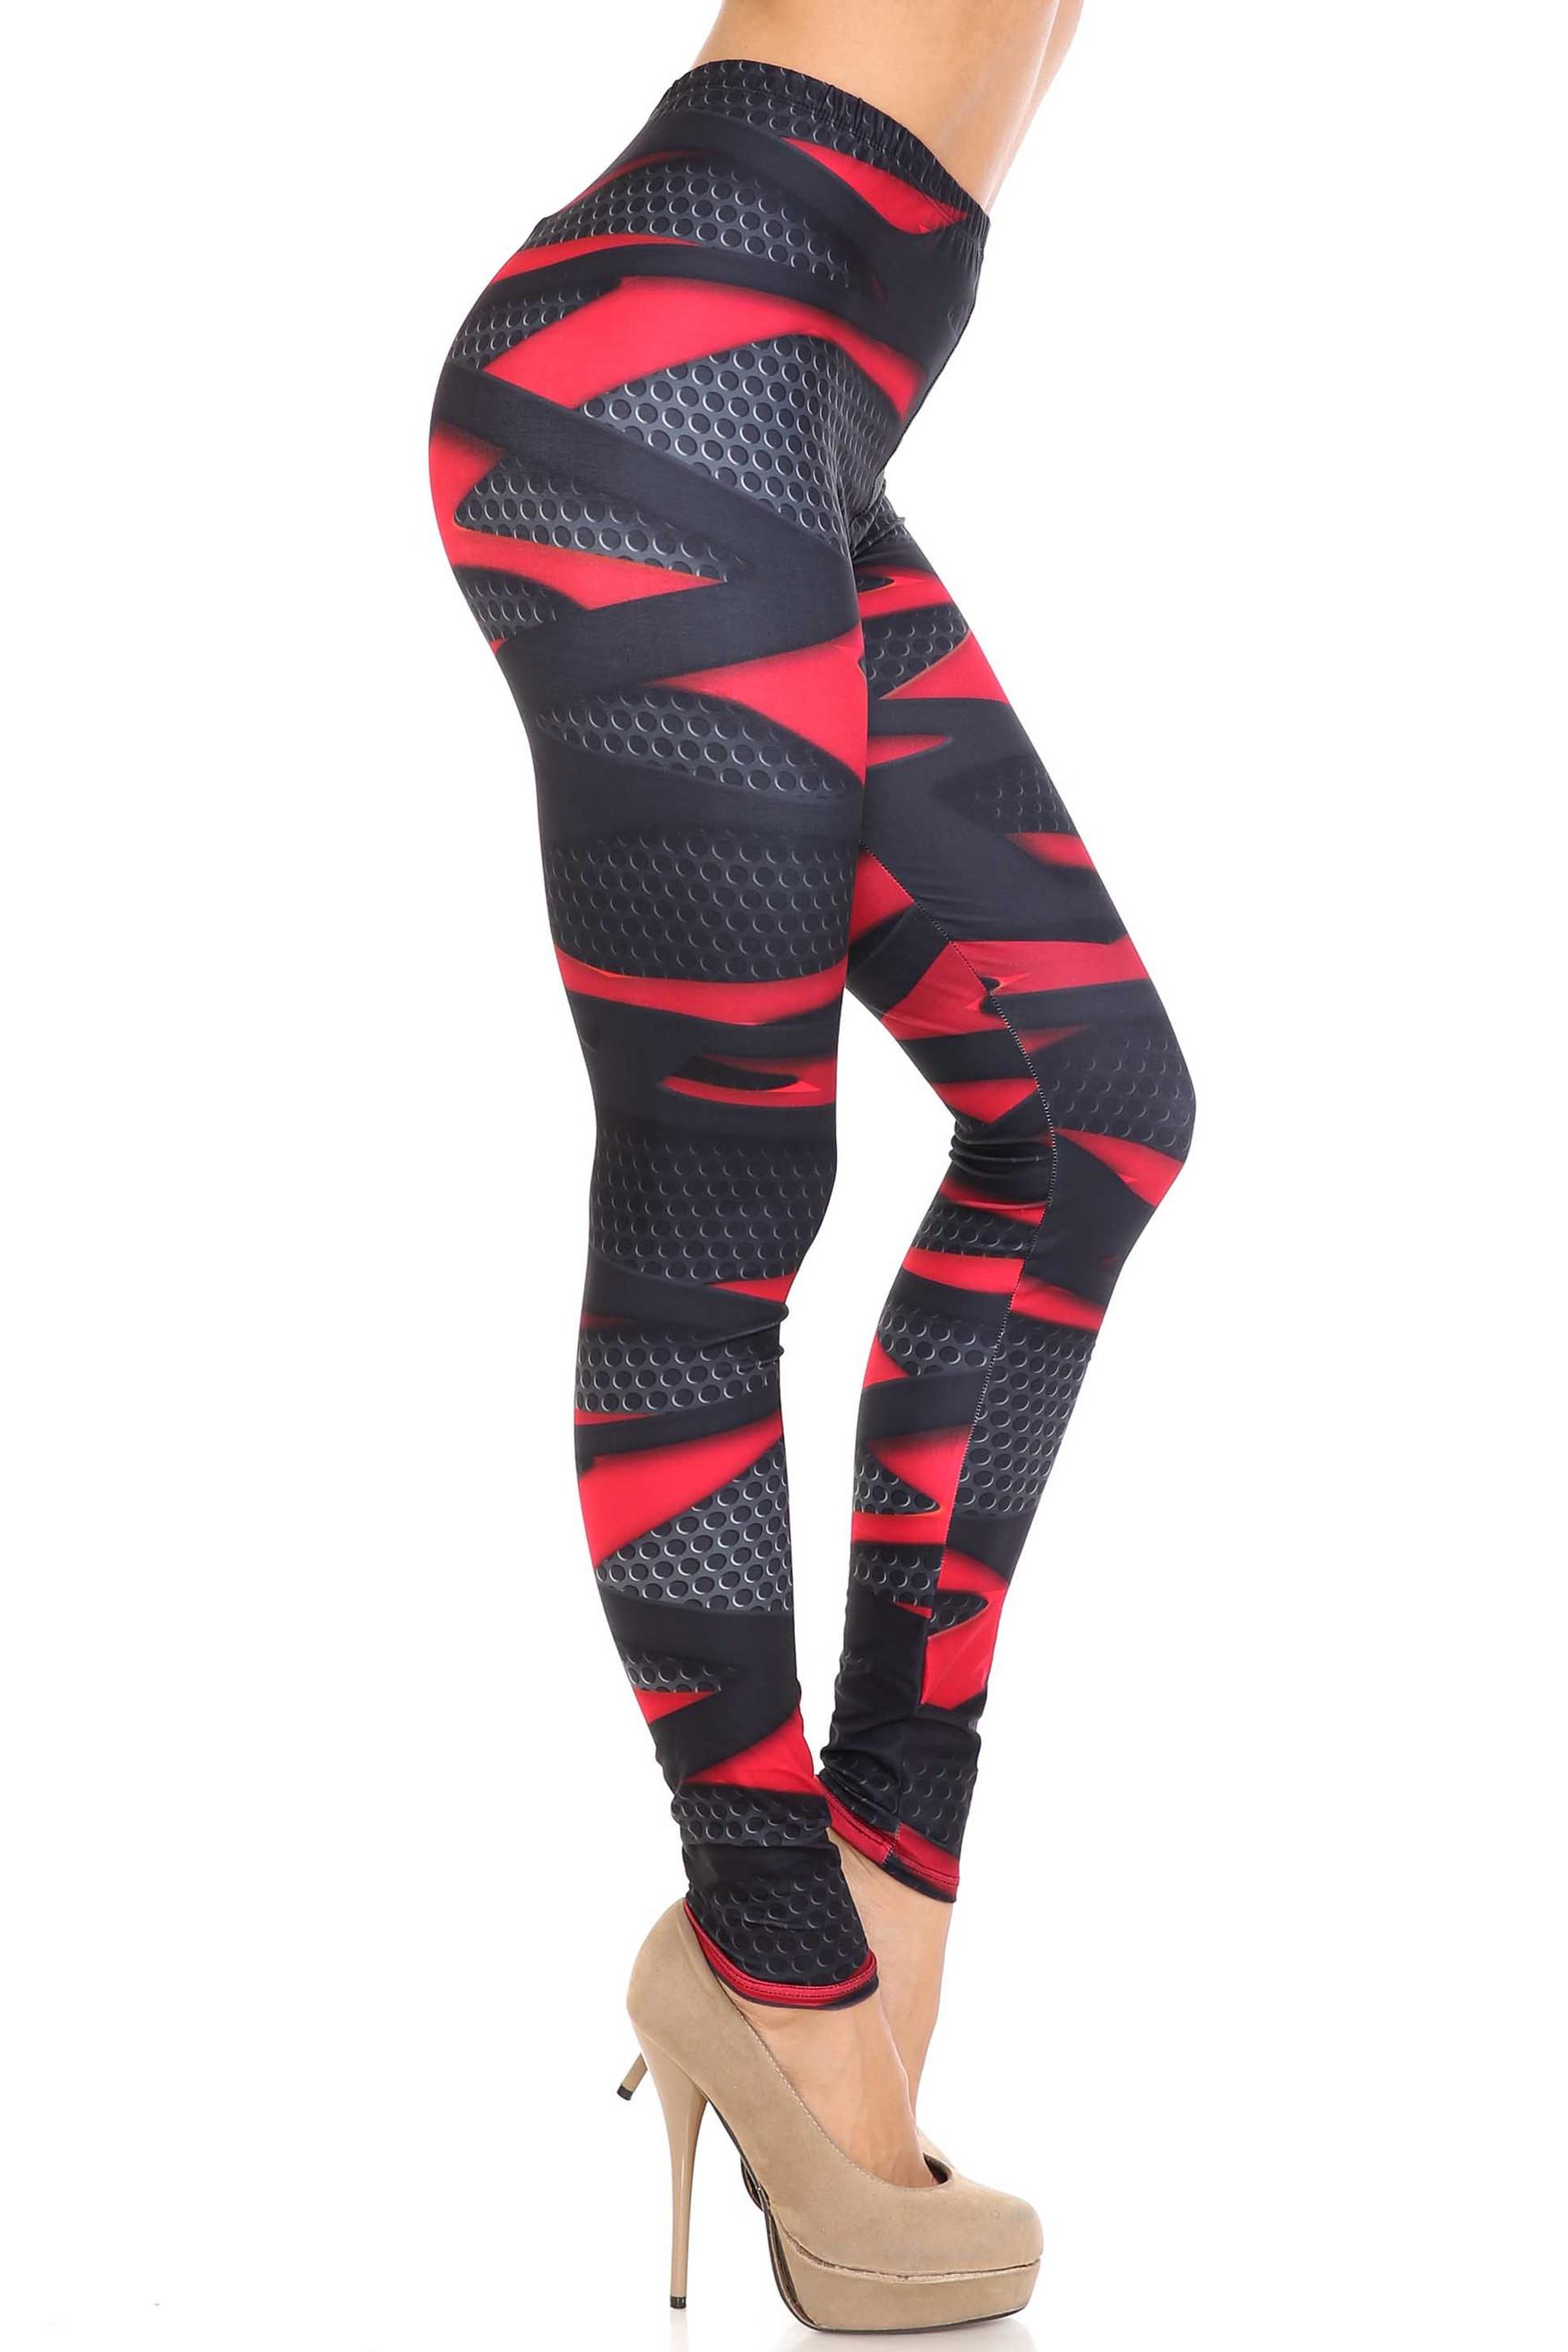 Creamy Soft Cascading 3D Sport Wrap Extra Plus Size Leggings - 3X-5X - USA Fashion™